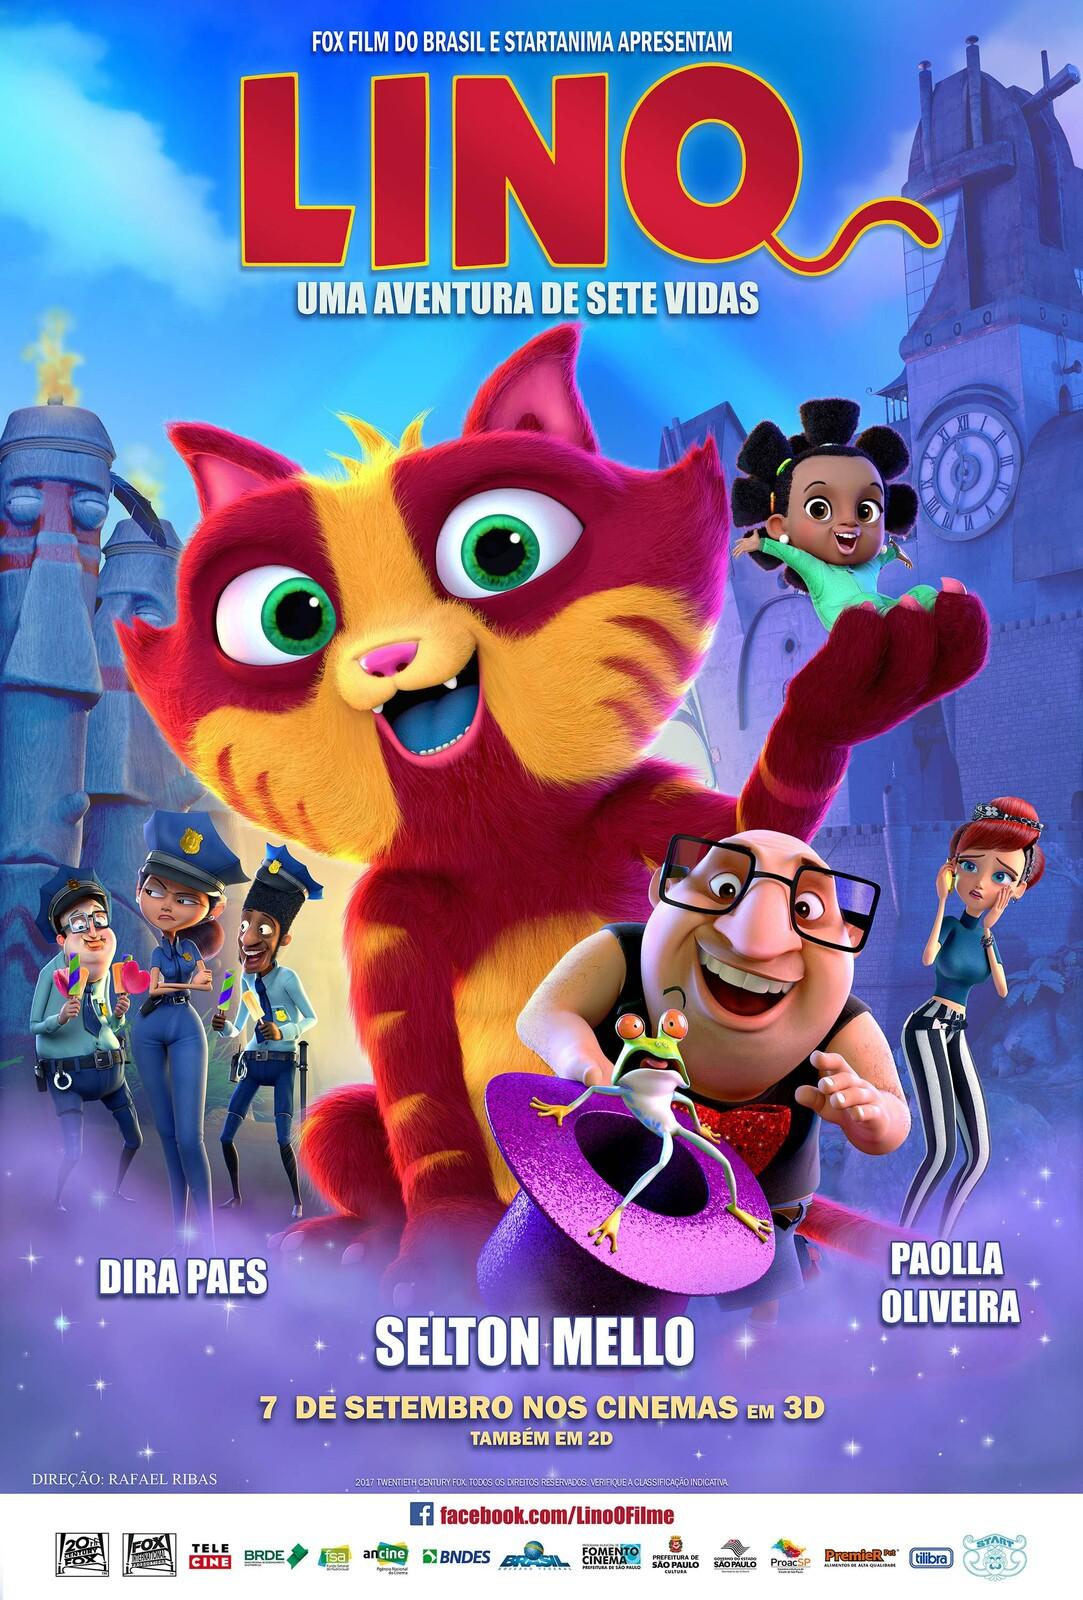 Brazilian movie poster